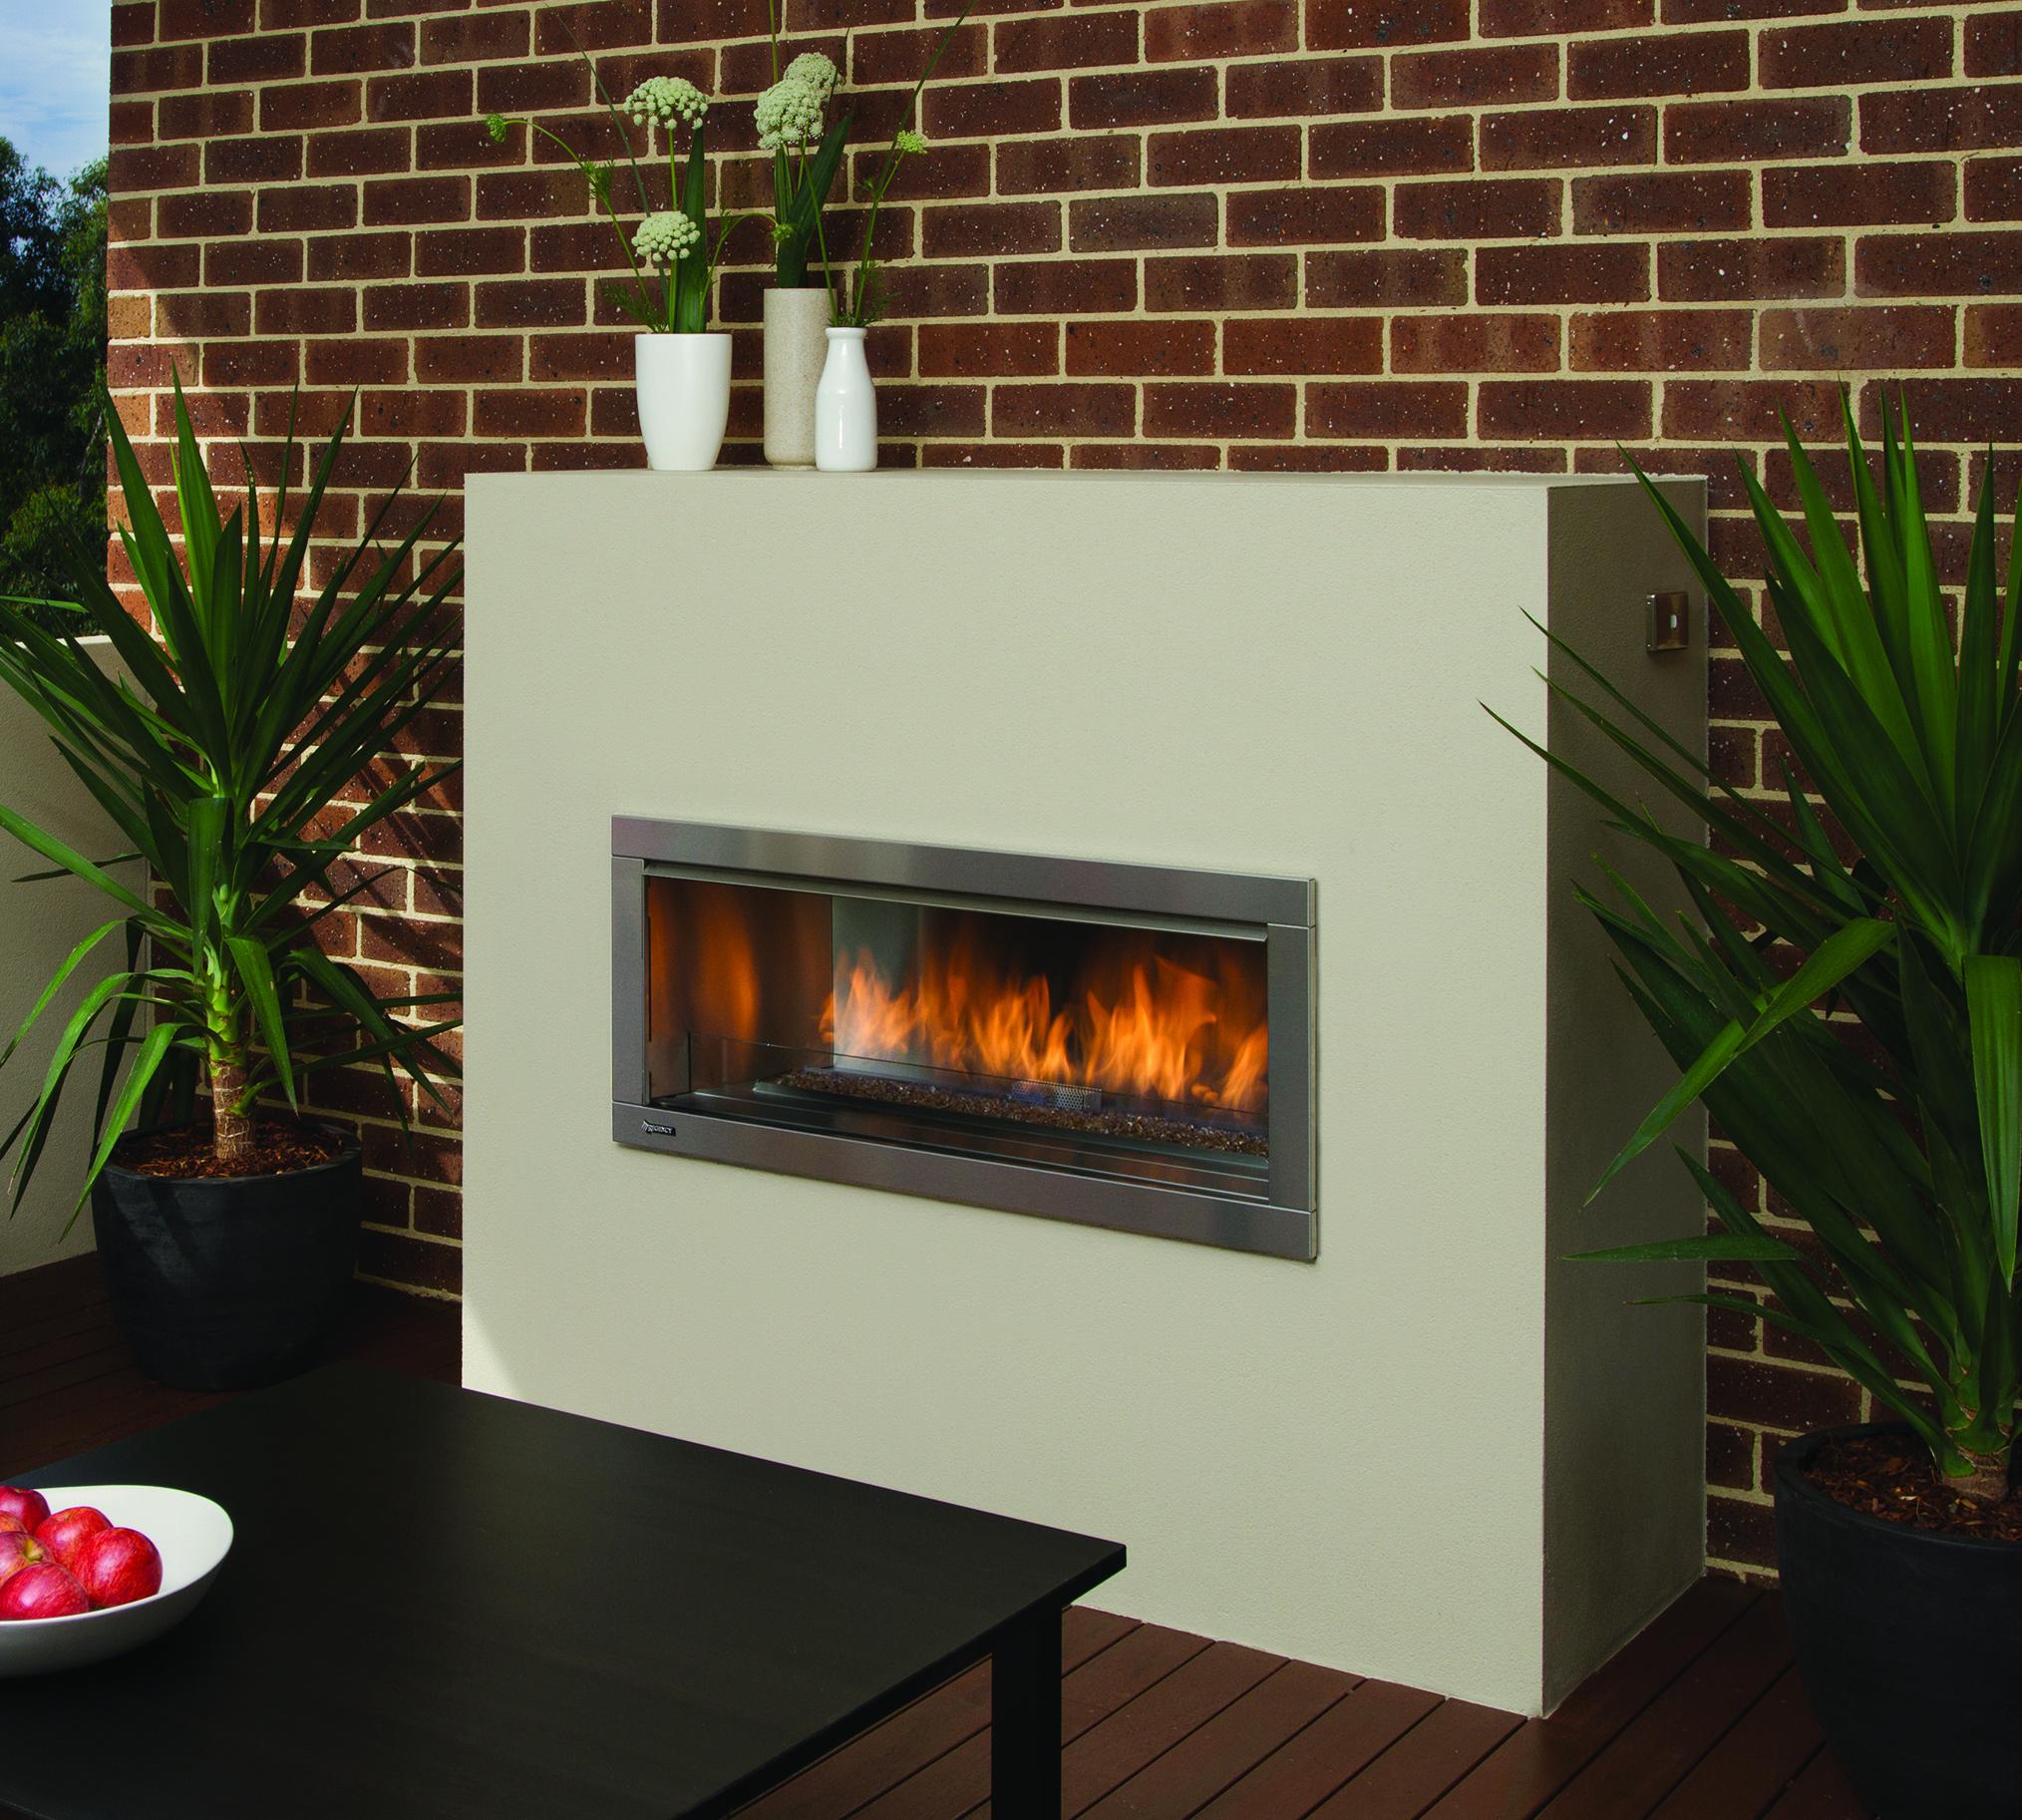 Outdoor Gas Fireplaces - Horizon HZO42 - Kastle Fireplace on Outdoor Gas Fireplace For Deck id=18097